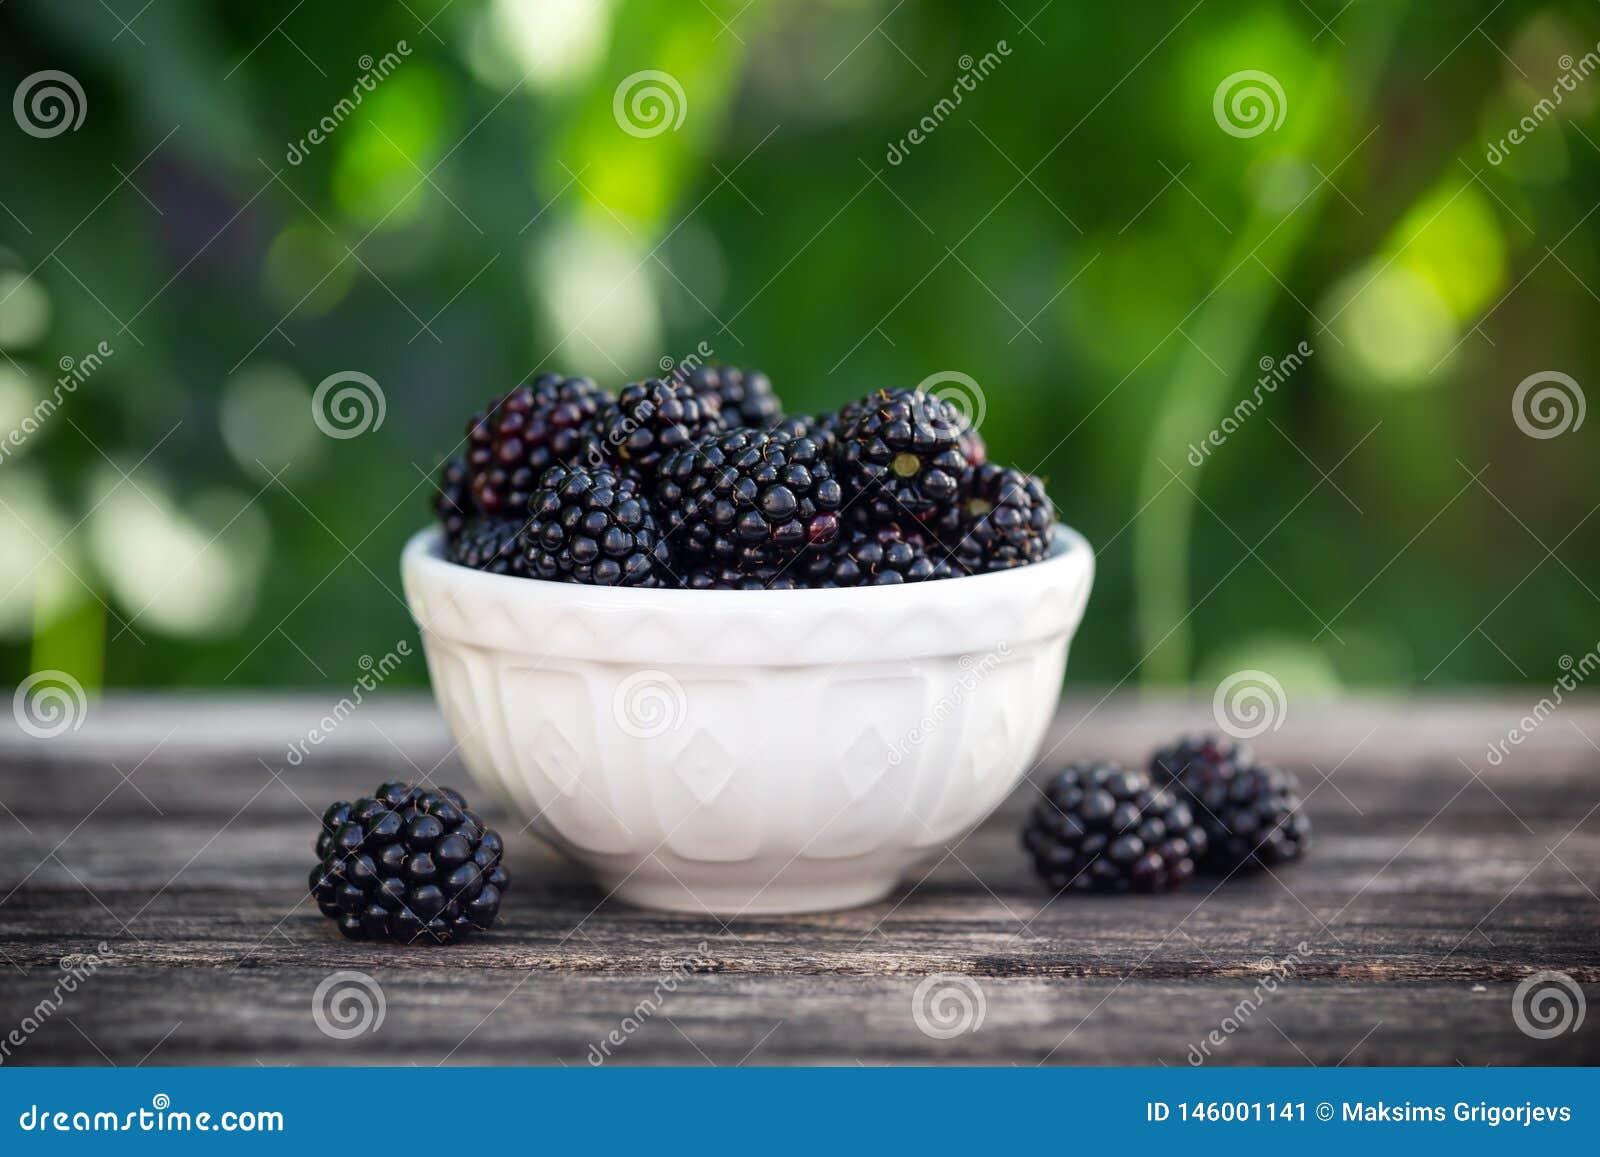 Blackberry i liten bunke på trätabellen i trädgård